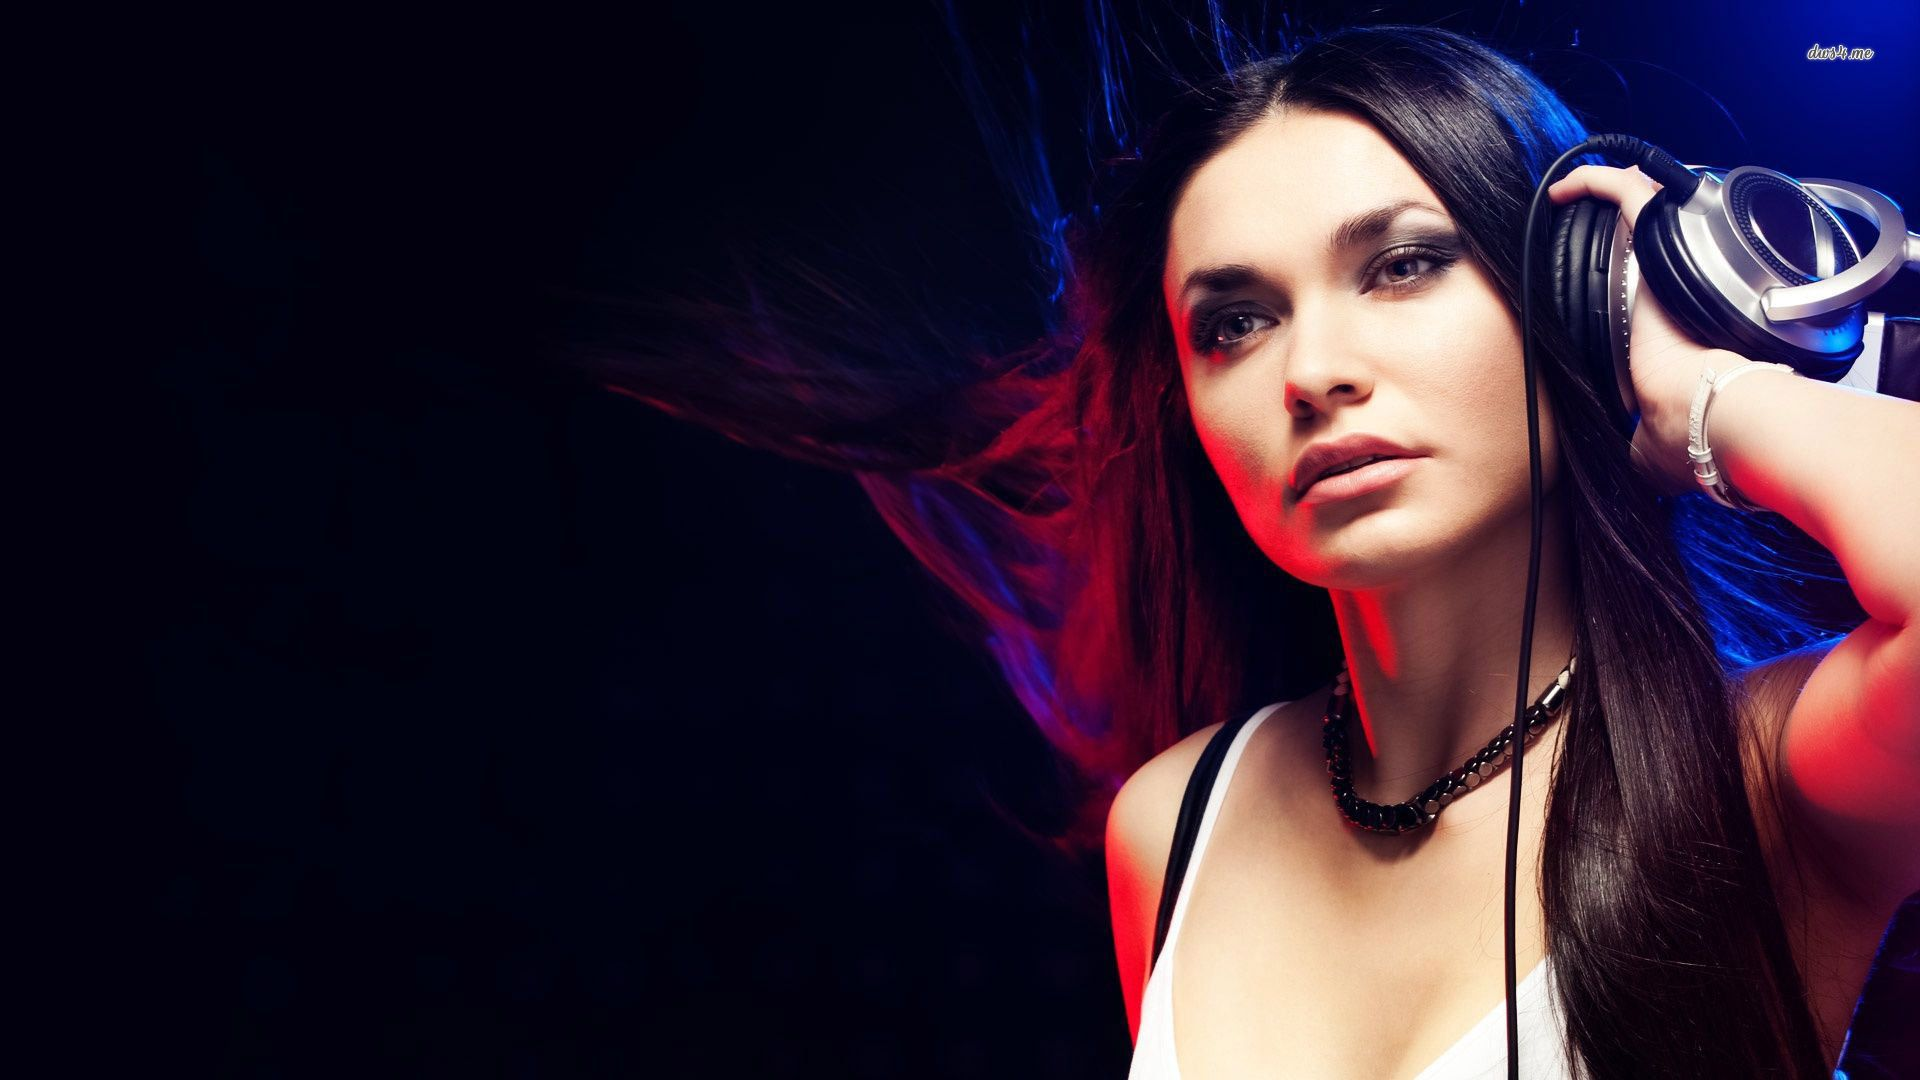 Armenian Dj For Private Events Girl Dj Dj Photos Dj Pics